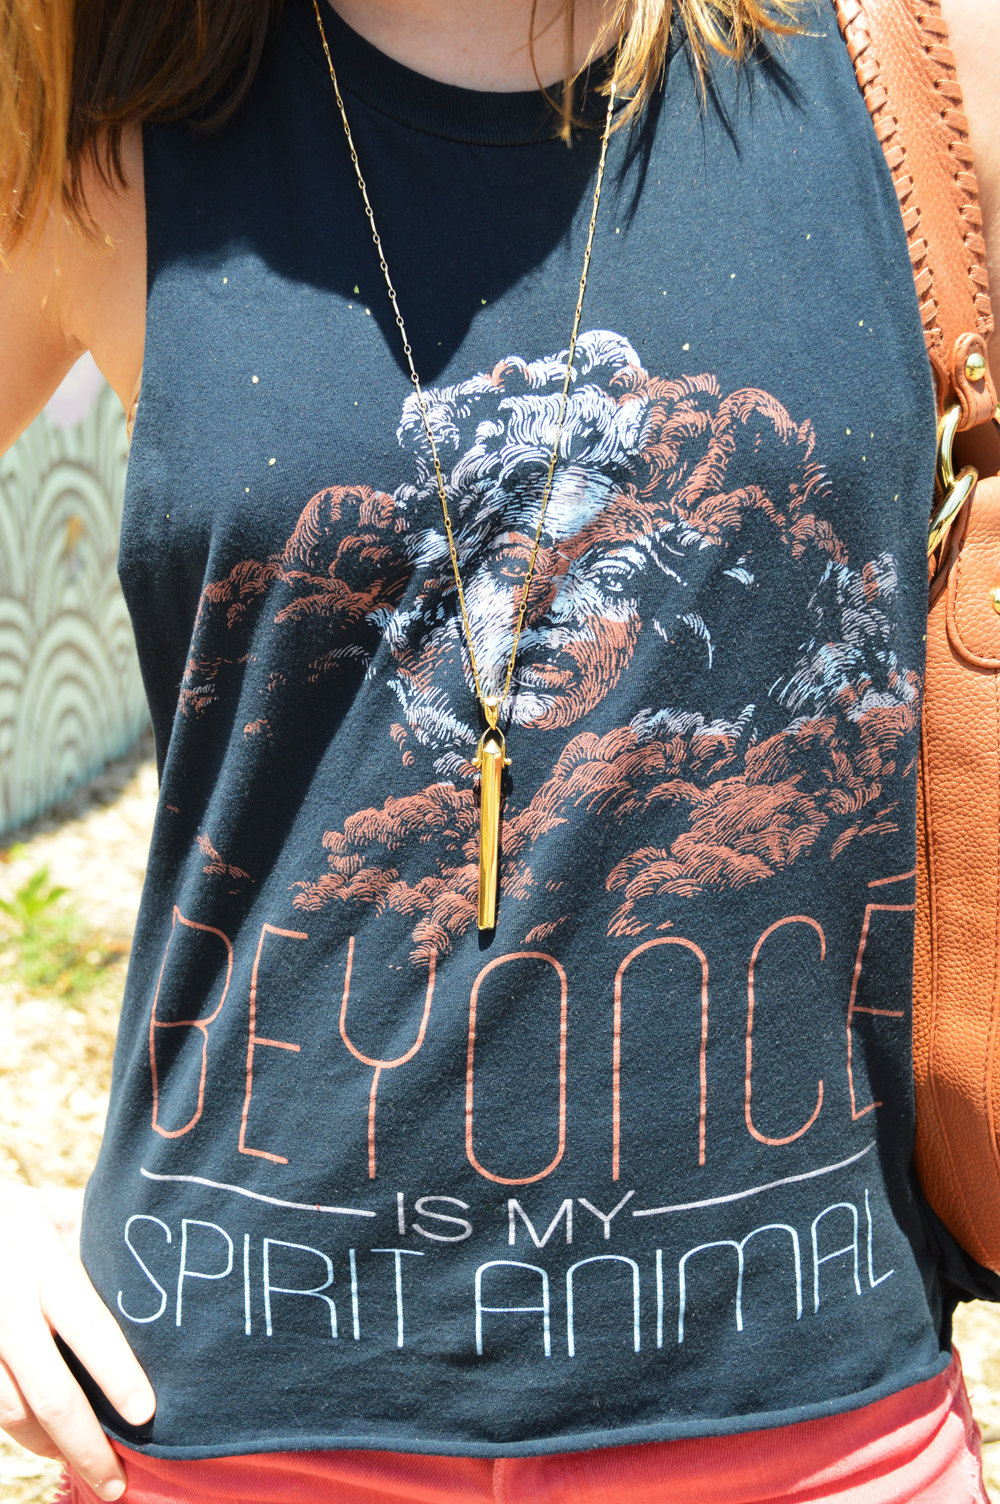 Beyonce-Spirit-Animal-Shirt-Atlanta-OOTD-forever21-coral-denim-shorts-style-blogger-travel-casual.jpeg